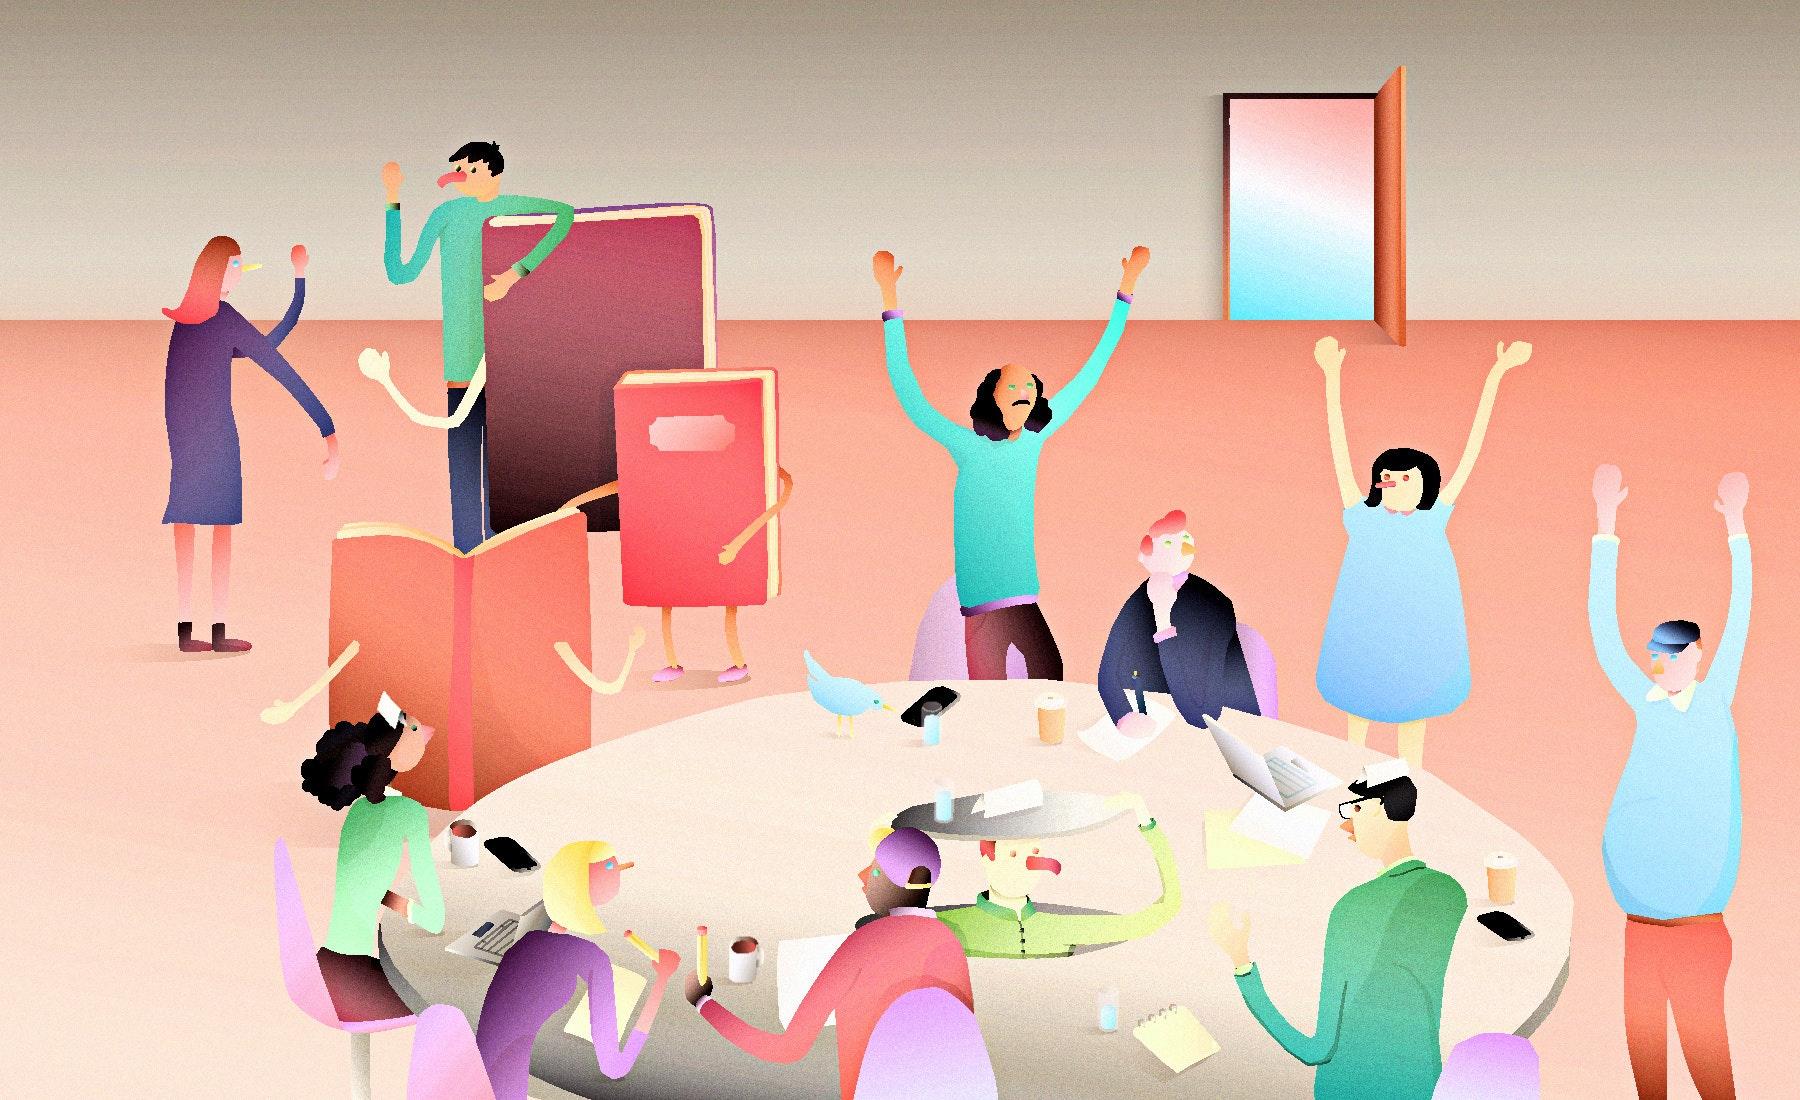 6 Ways To Kick Off A Meeting